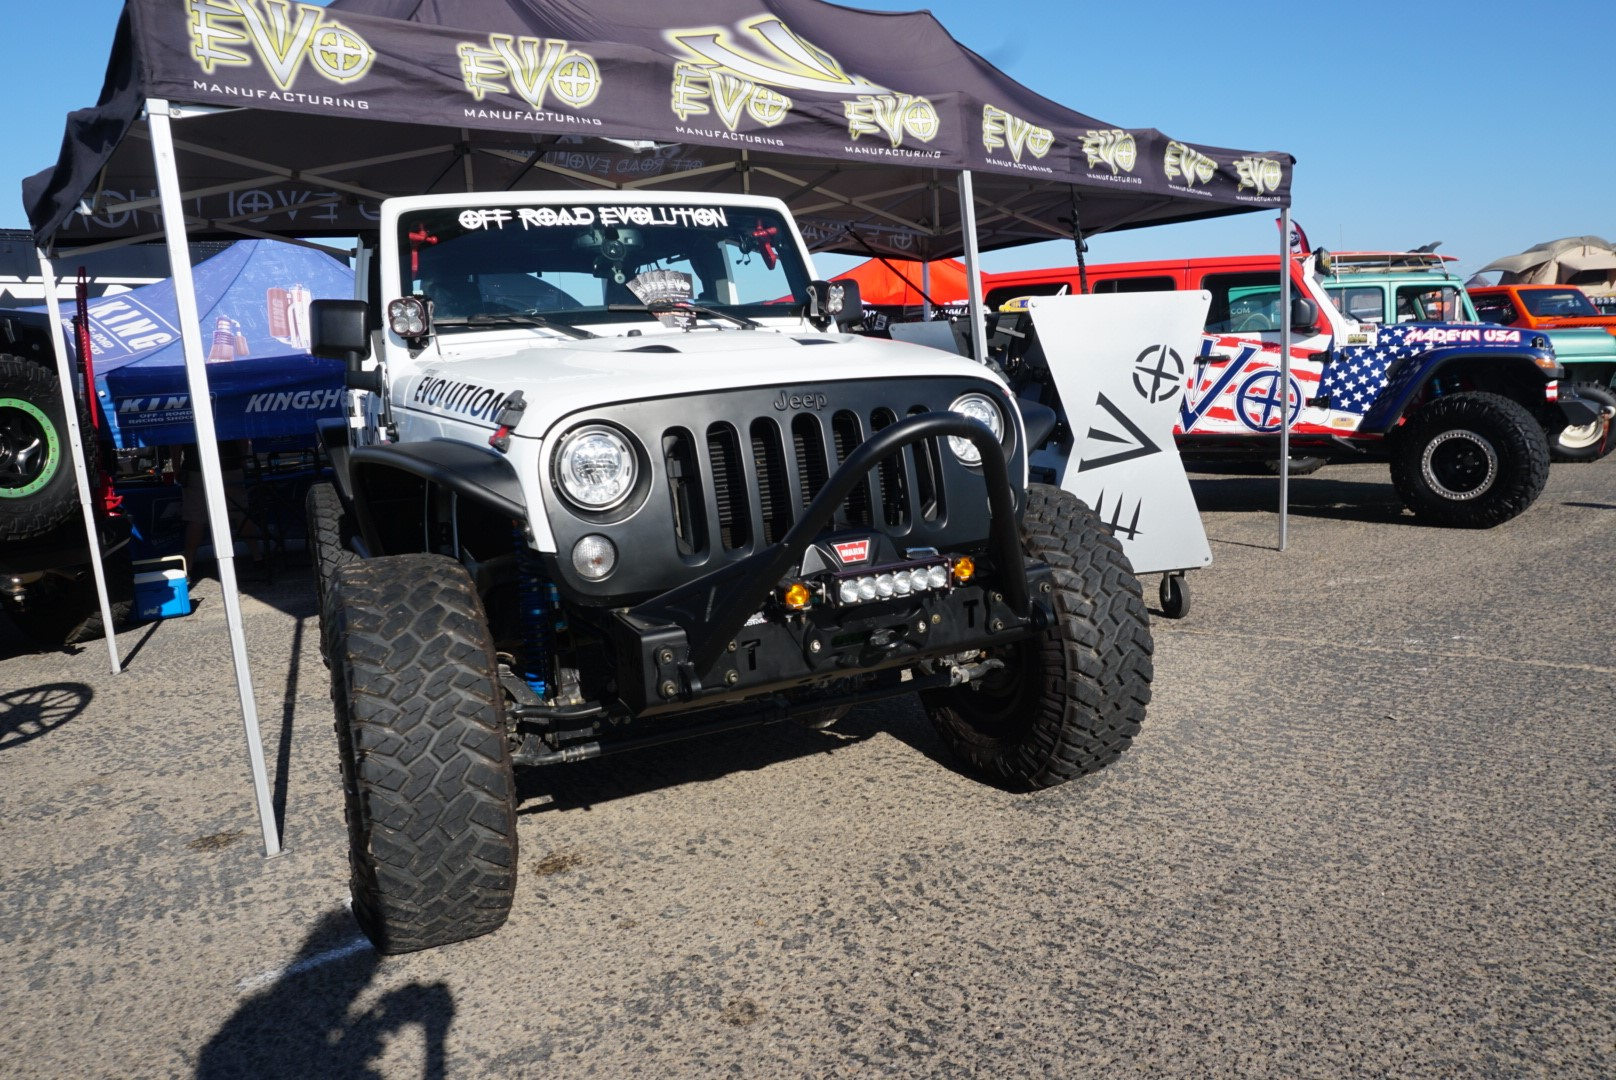 EVO MFG booth at Jeep Bash 2018